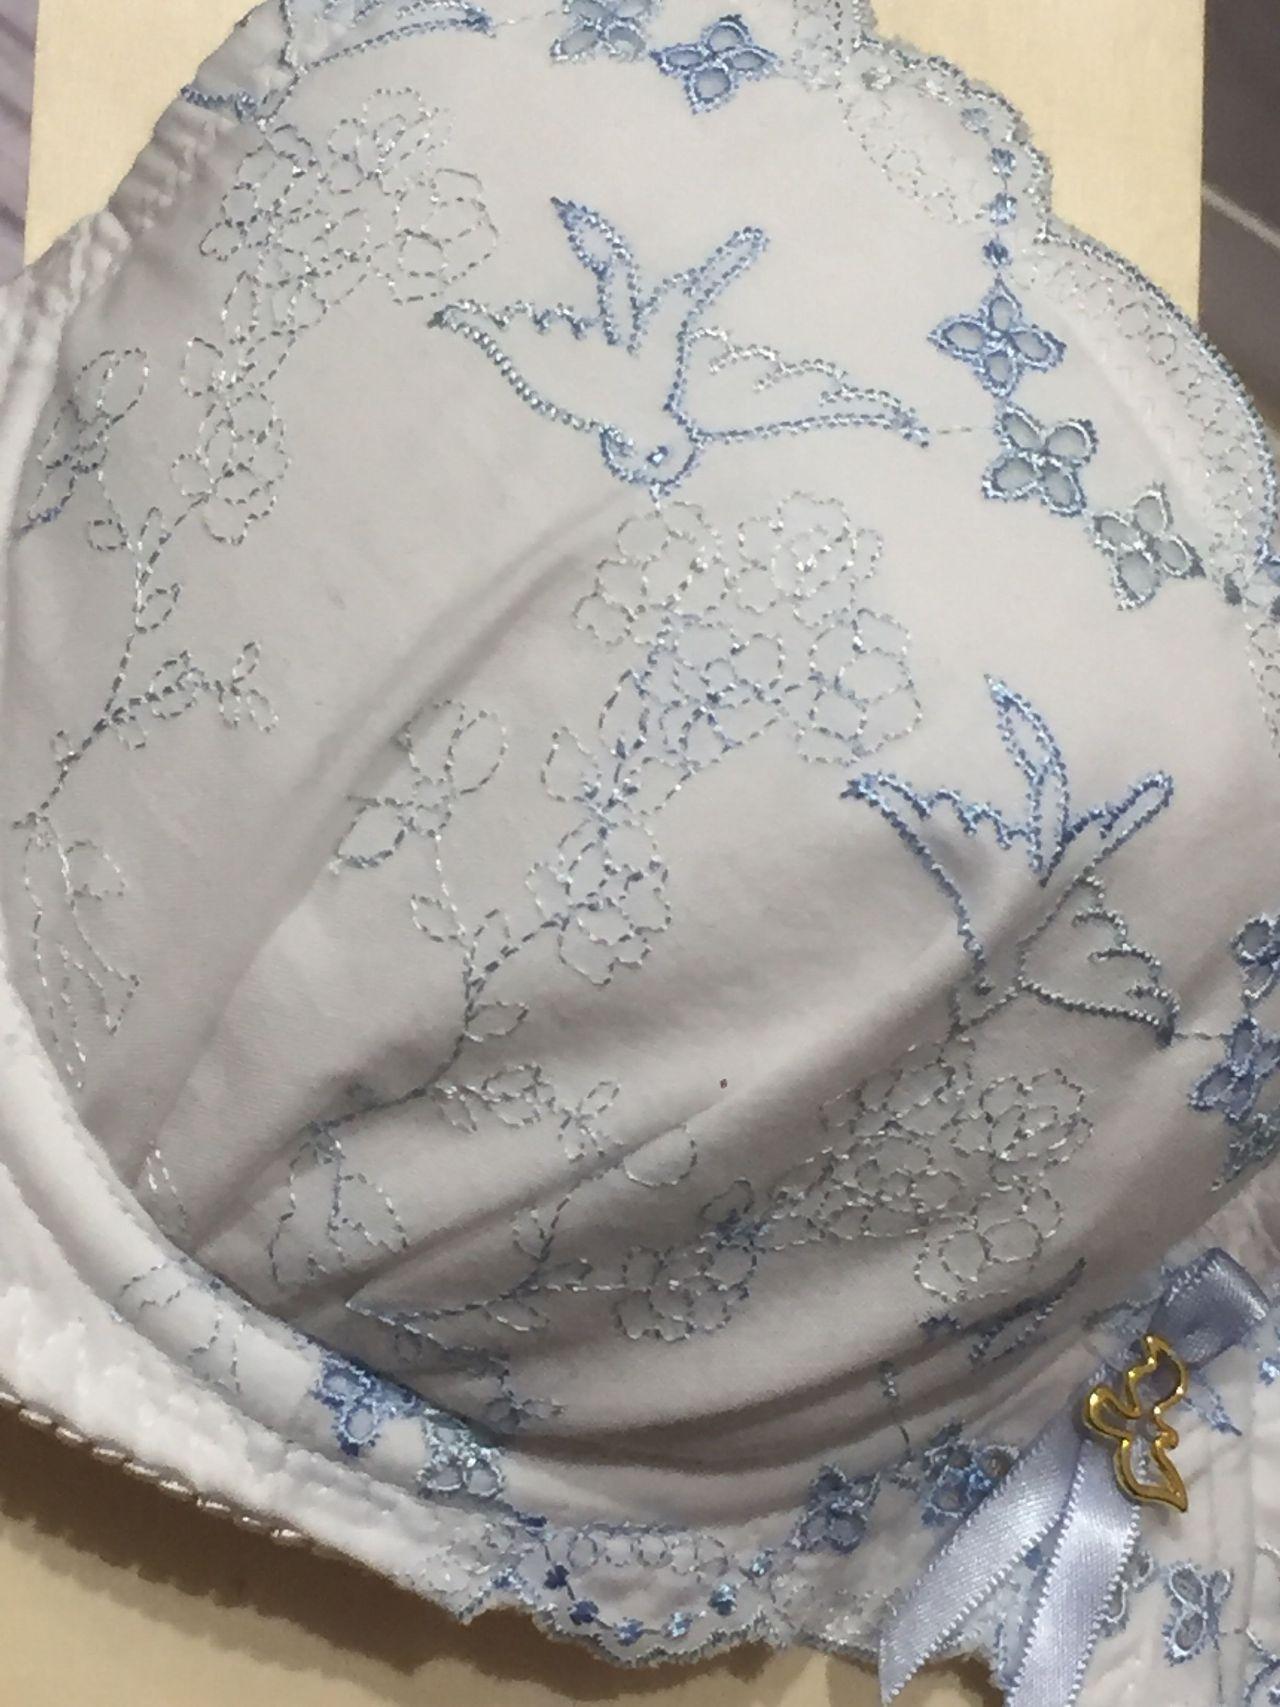 b6fe060d56834f カップには可愛いナイチンゲールという西洋ウグイスが刺繍されているアンテシュクレオリジナルの刺繍となります。